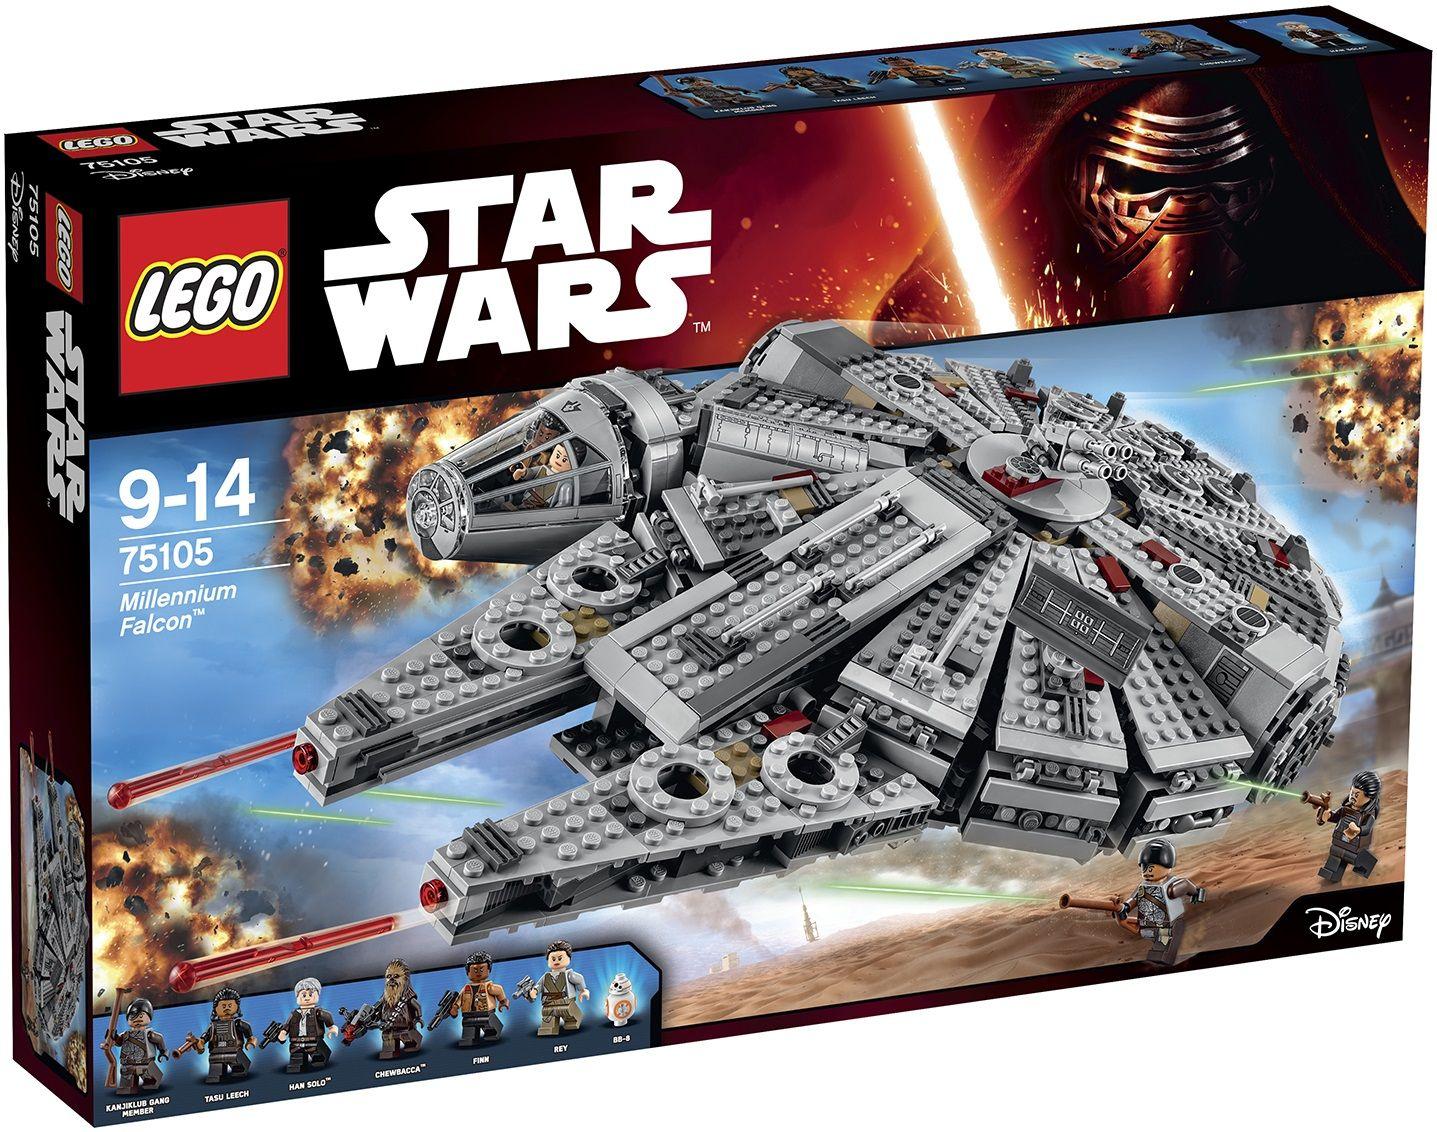 Lego star wars 75105 milenium falcon minifigures finally - Lego star warse ...